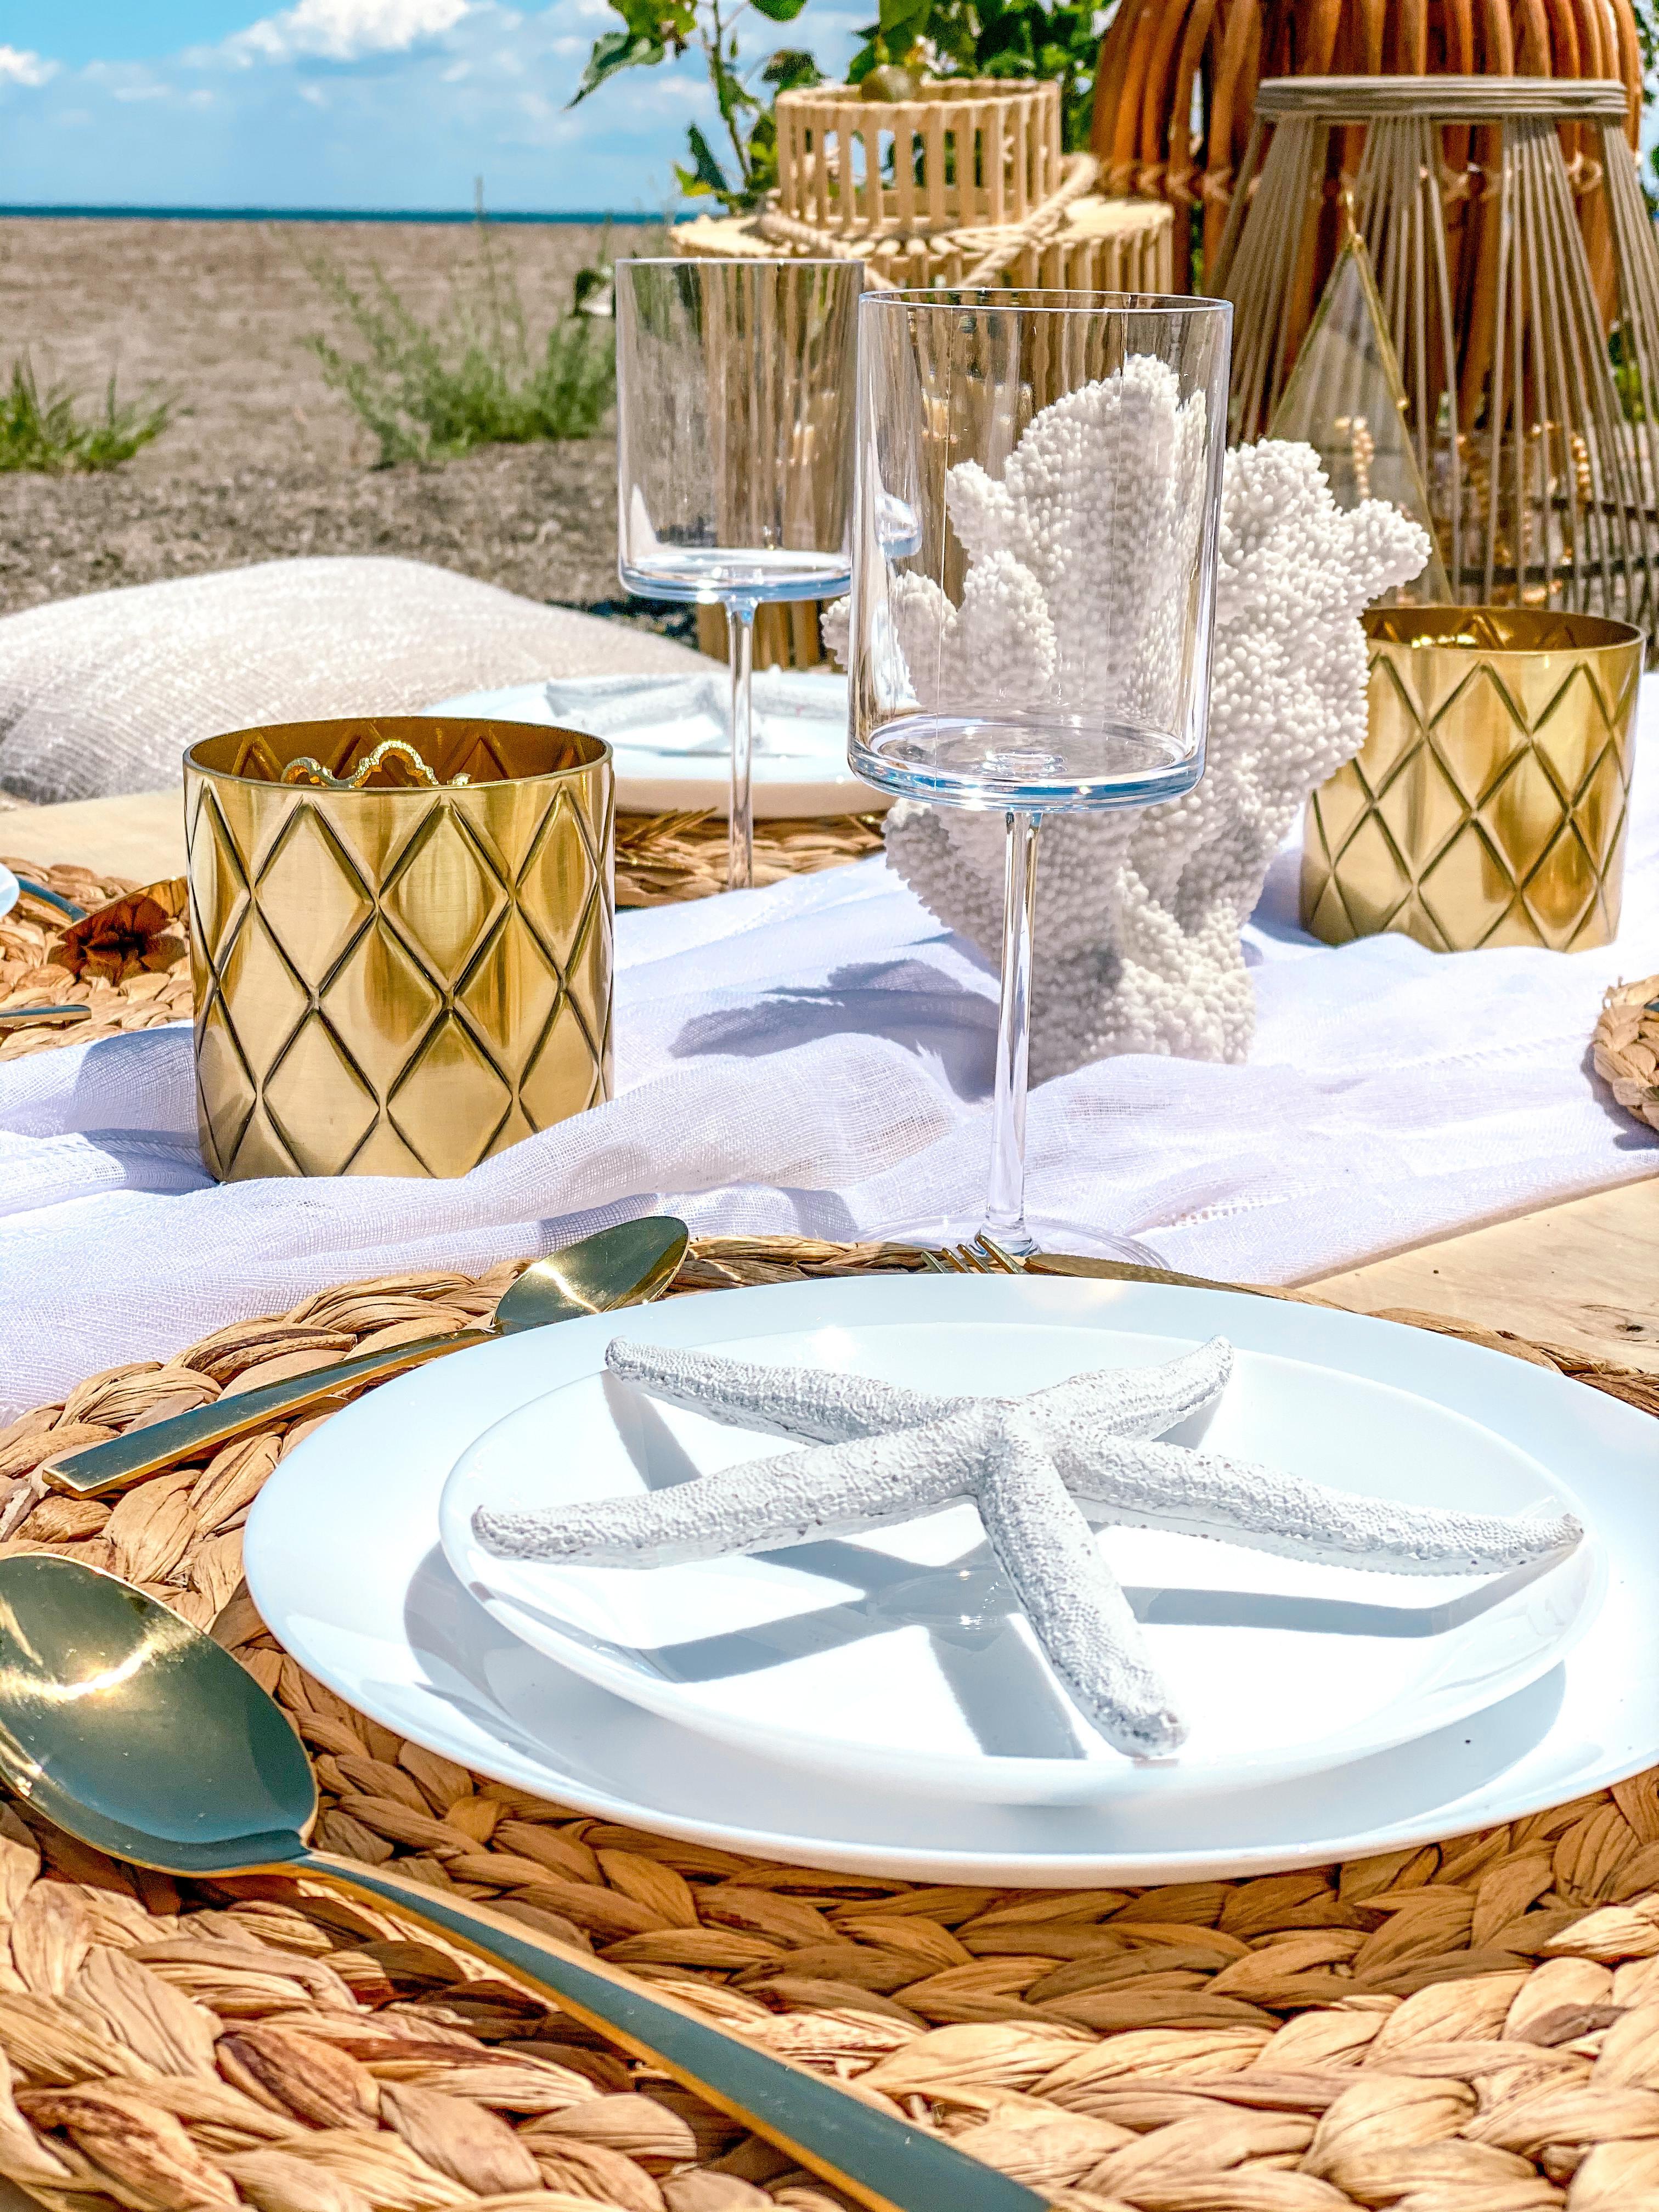 Luxe Beach Picnic (Set of 2)